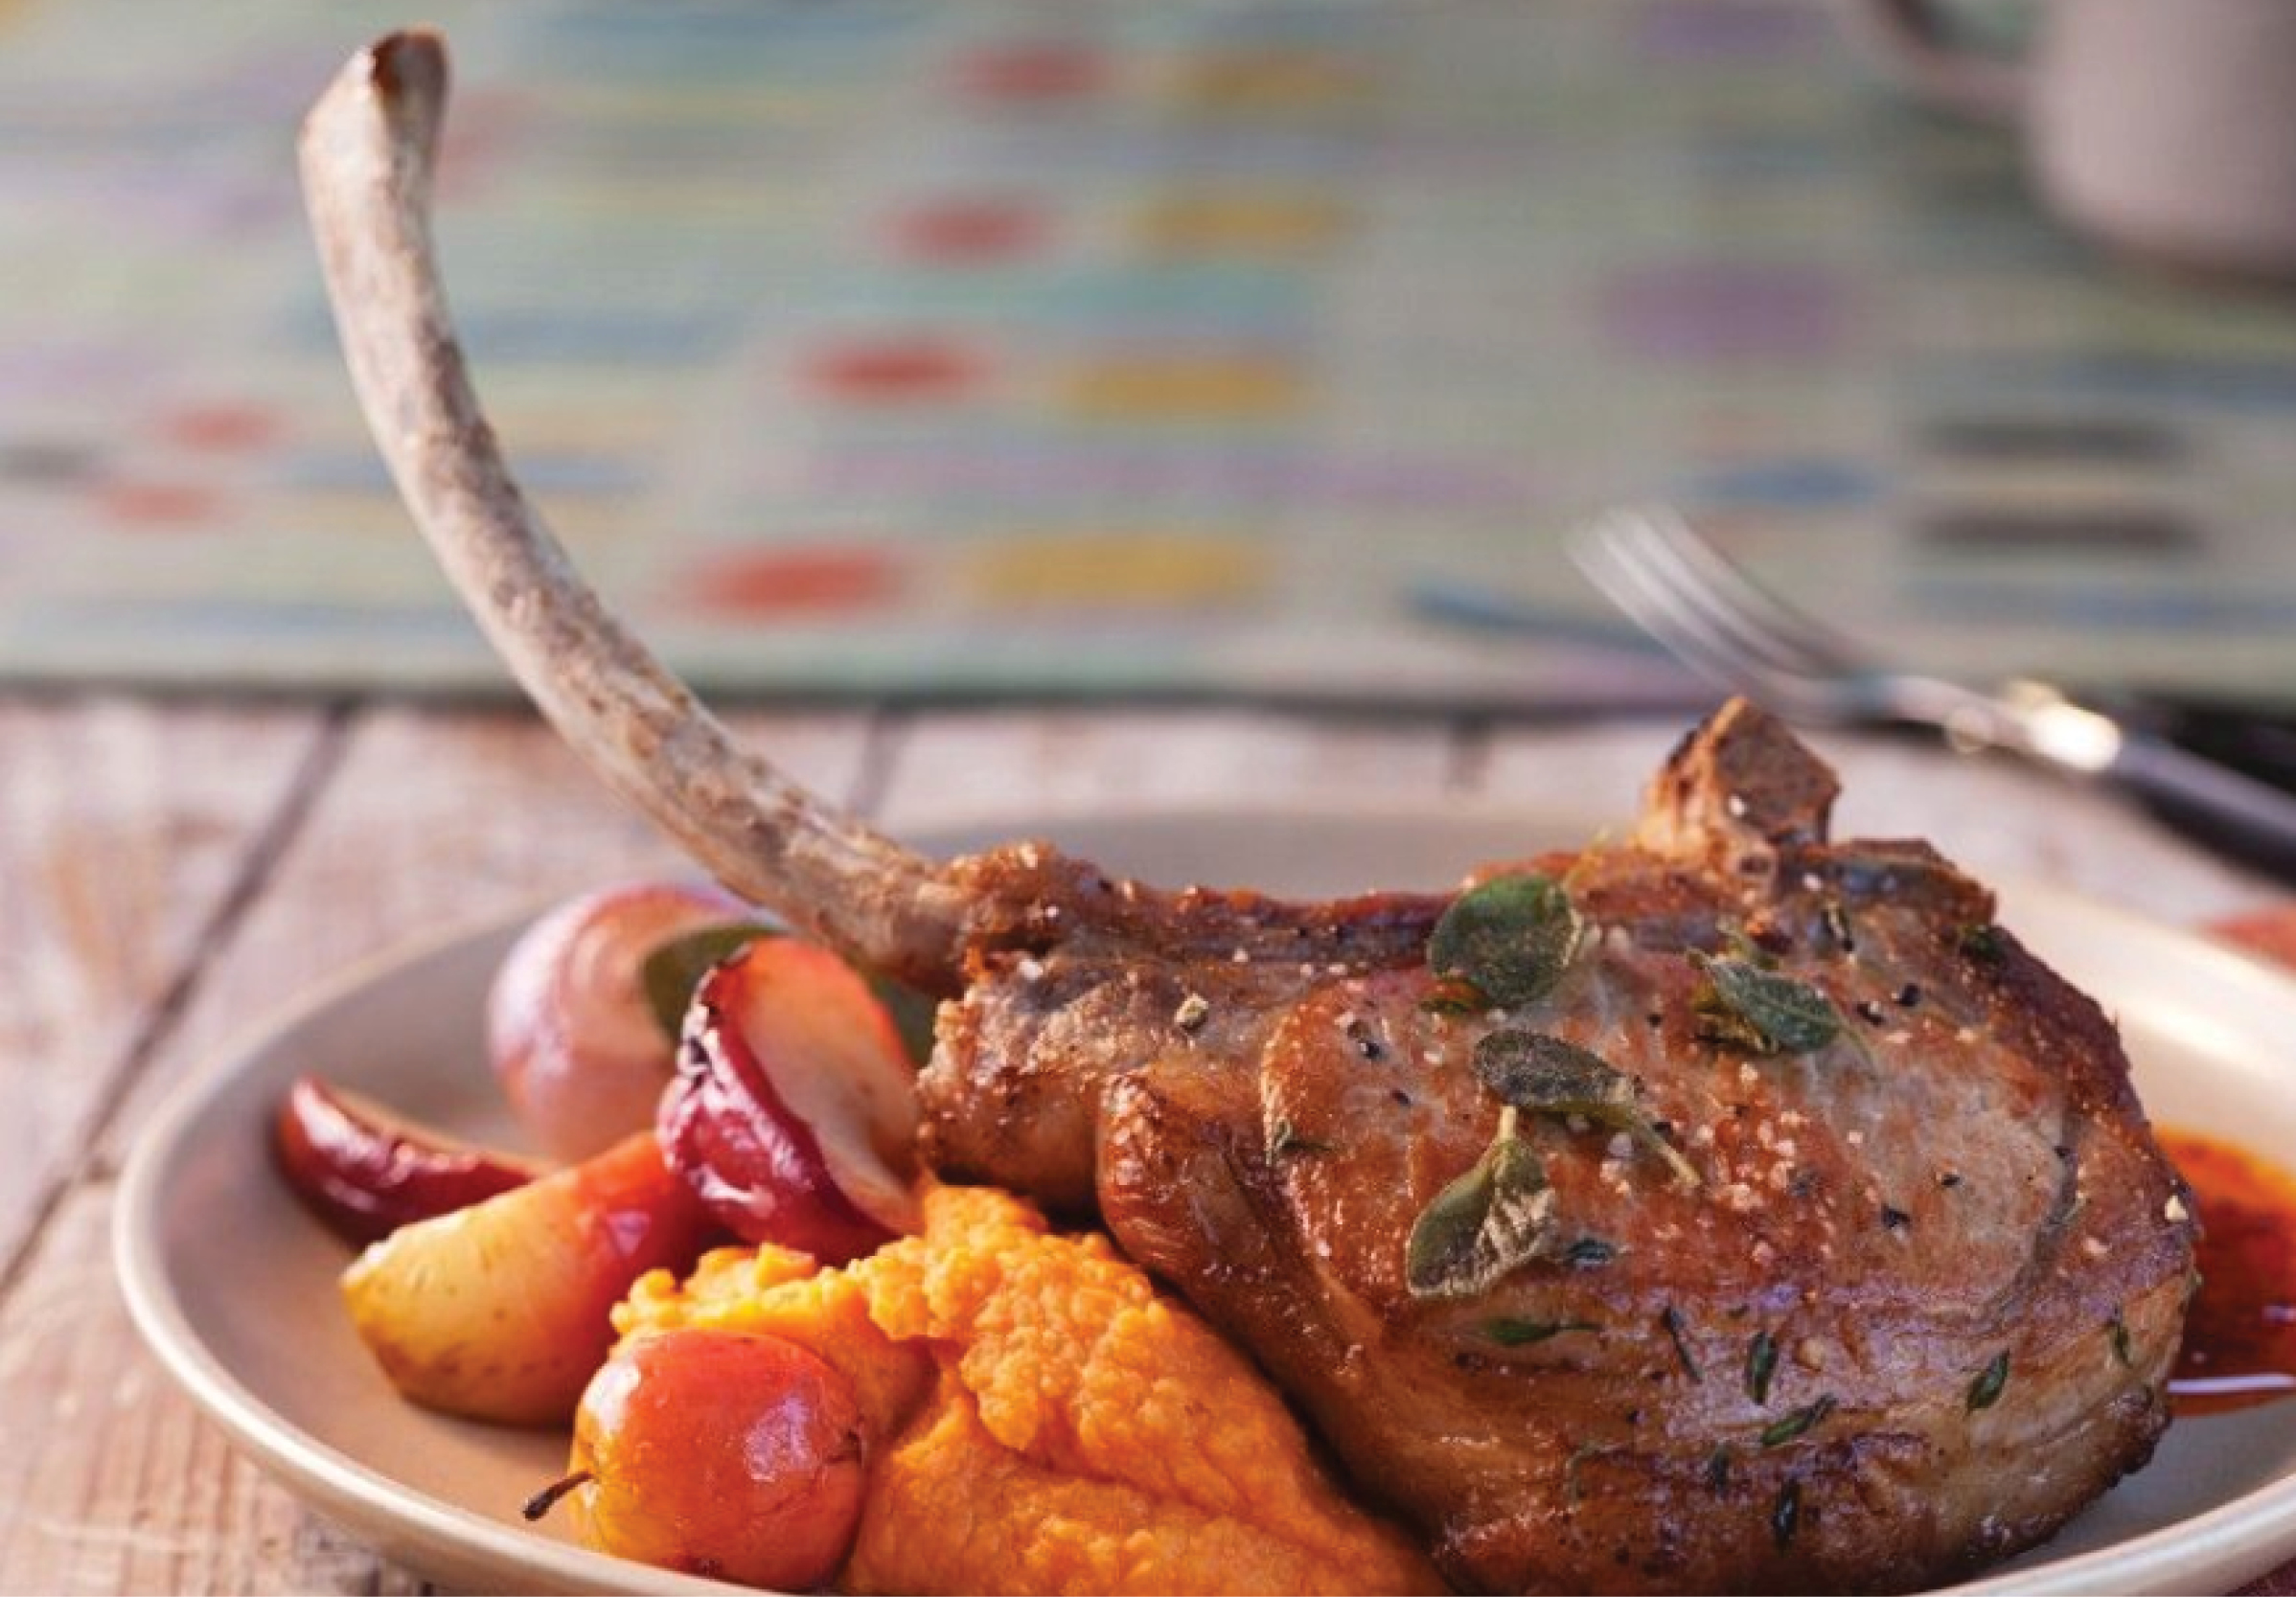 https://eatsmarter.com/recipes/pork-chops-with-potato-and-pumpkin-puree